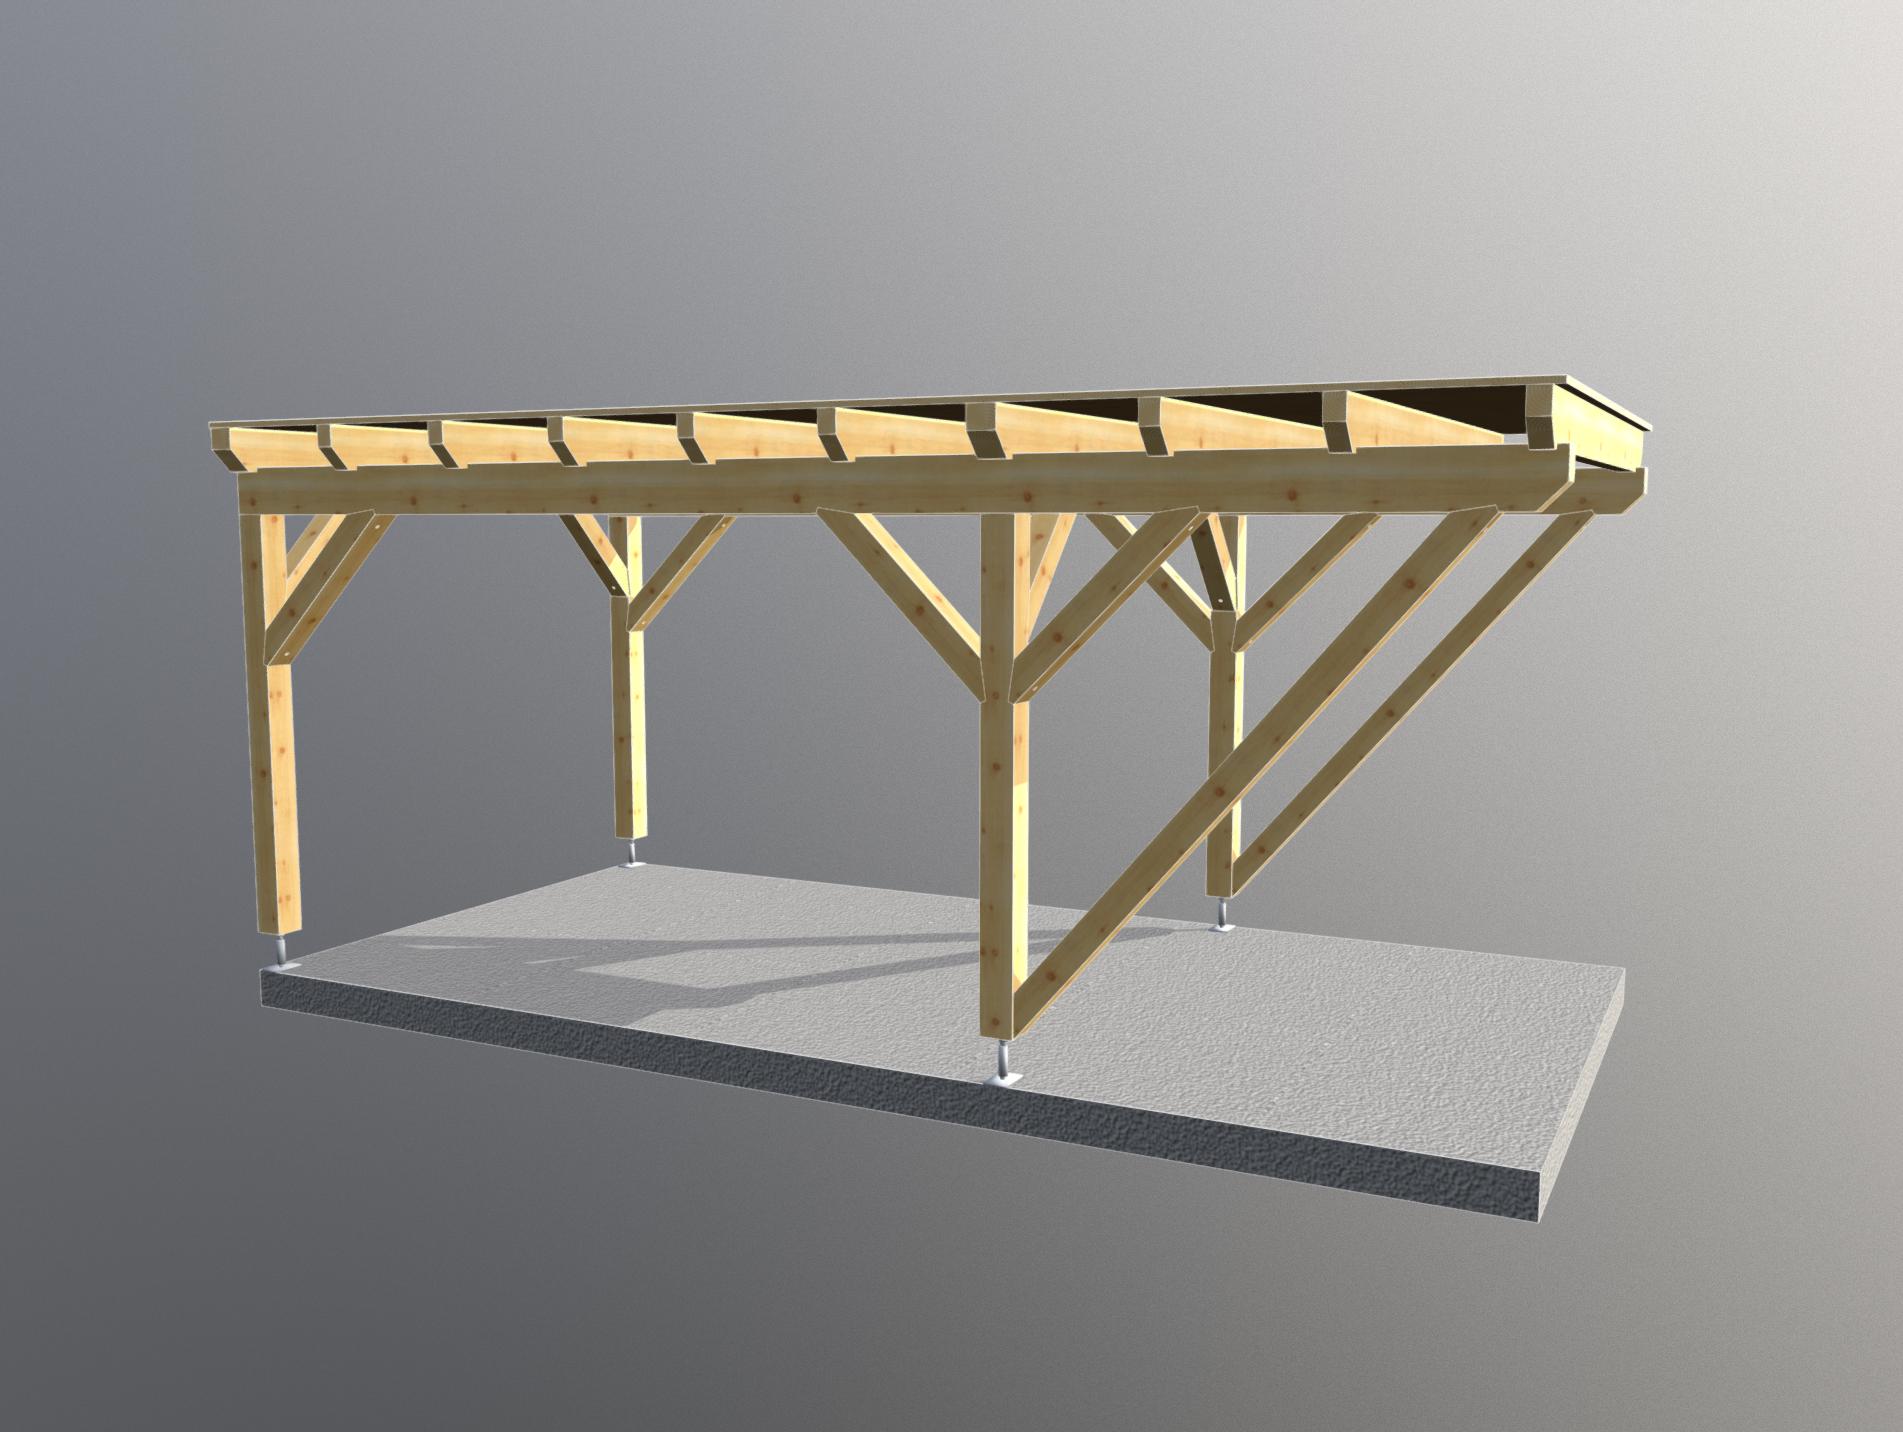 Holz Carport 3m x 6m flachdach, carports aus polen